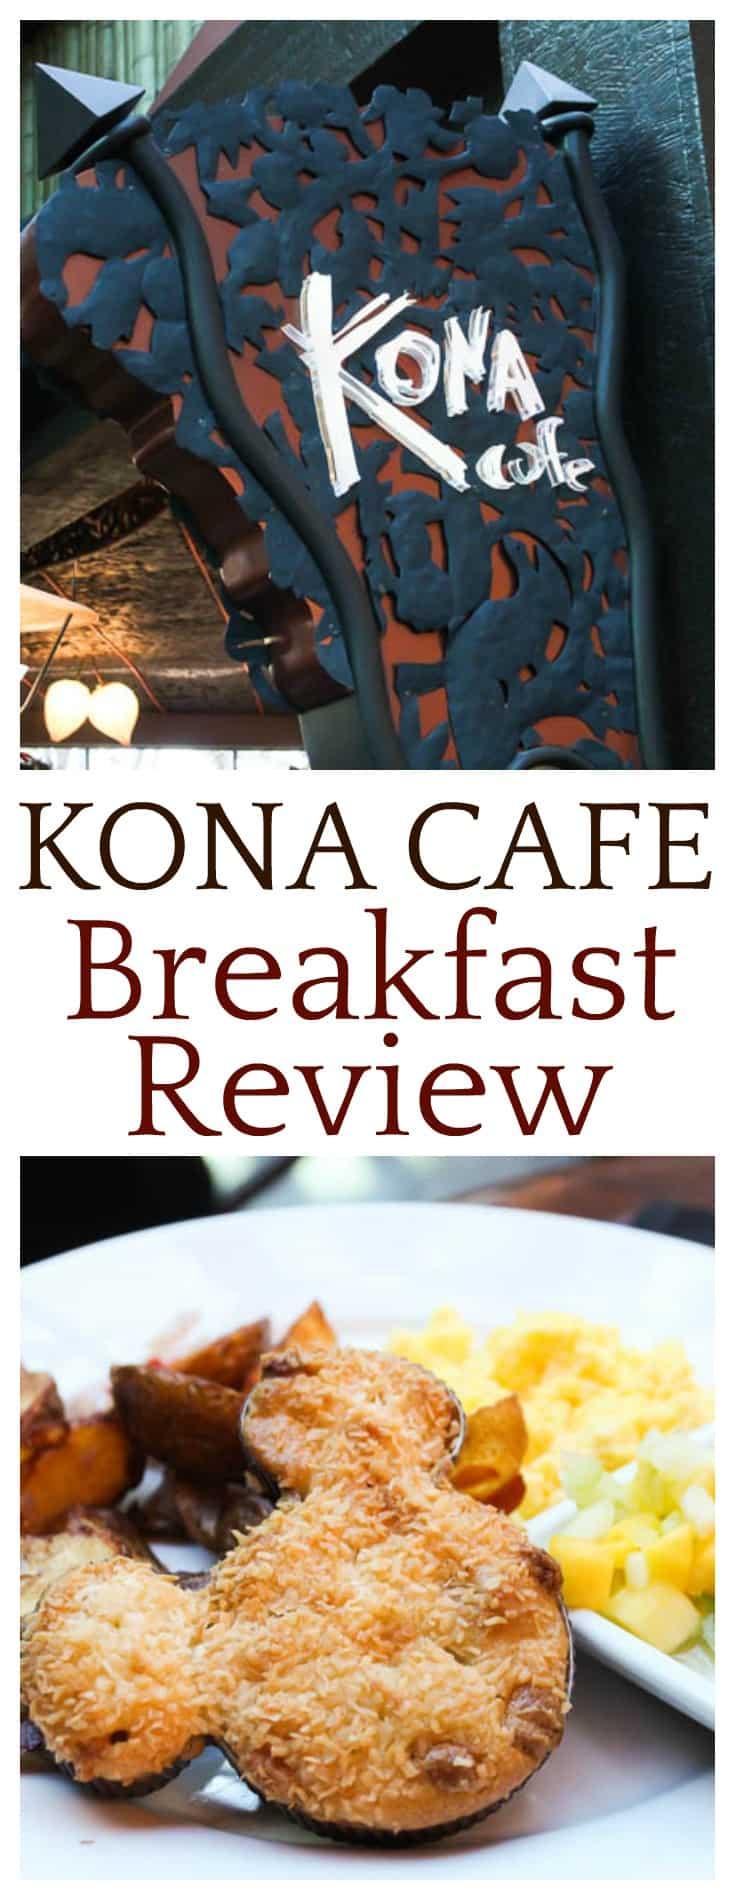 Banana Cafe Reviews